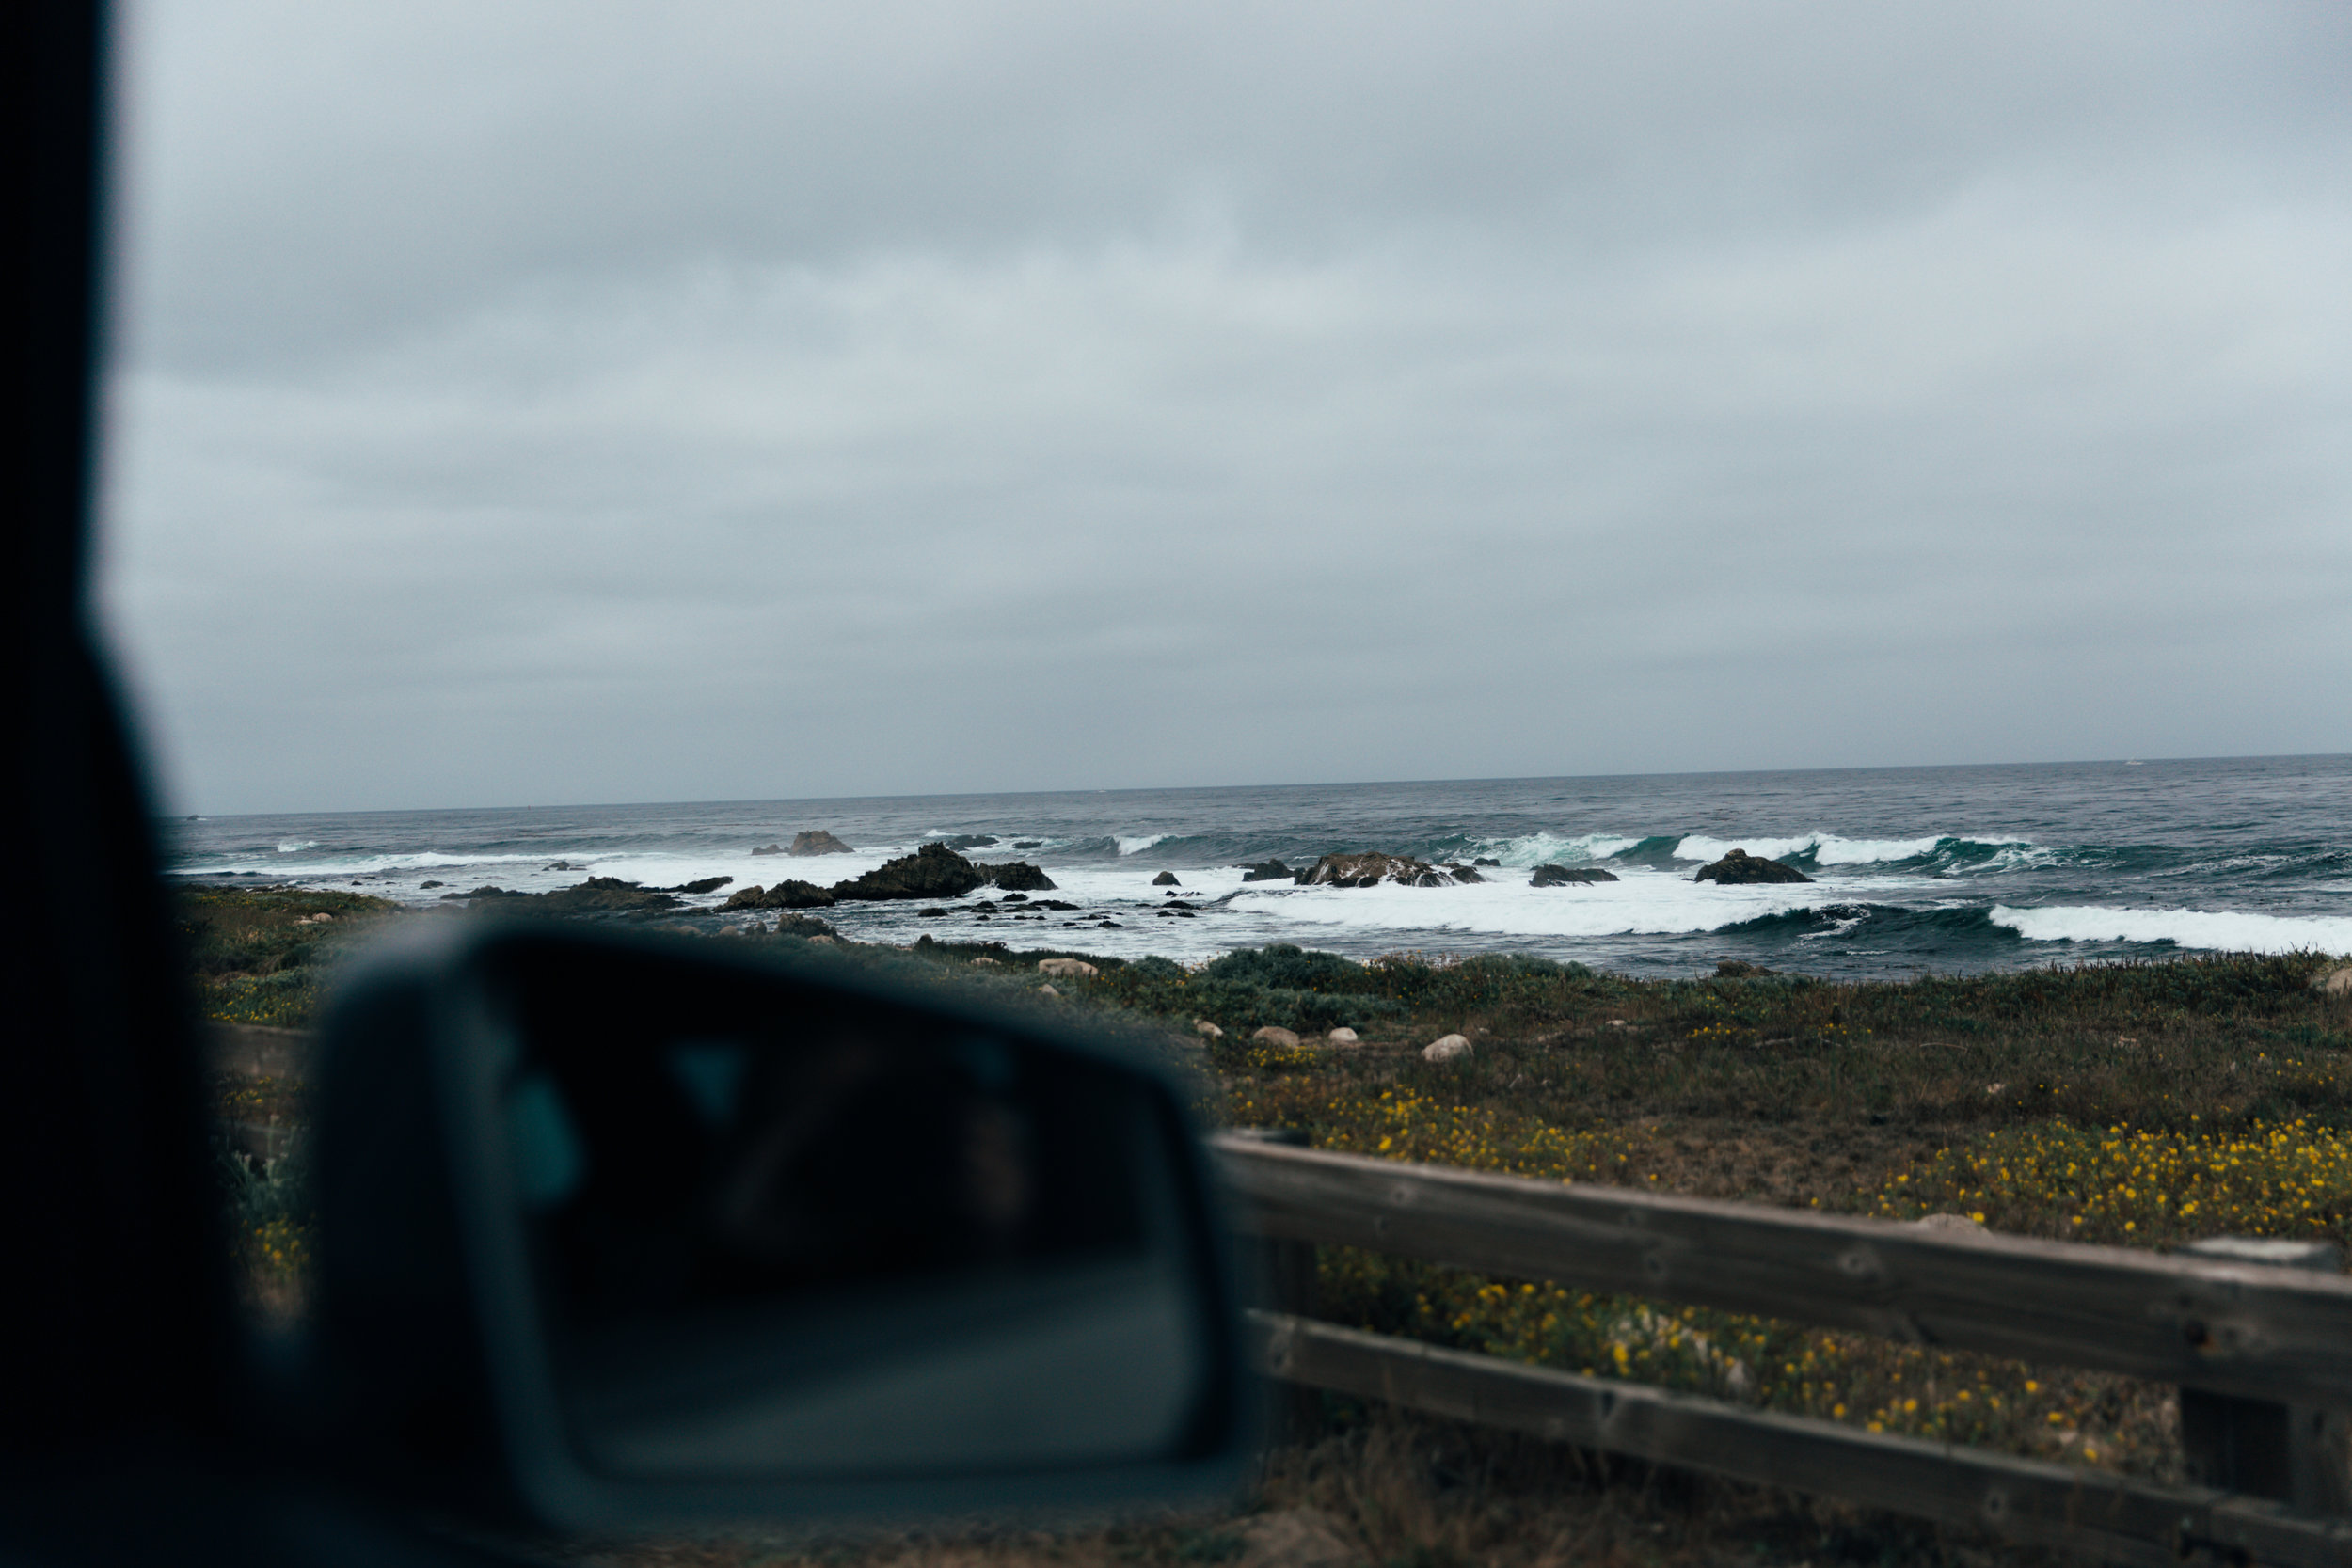 Stay_Driven_Monterey_Car_Week_Whitesse_Koenigsegg-46.jpg